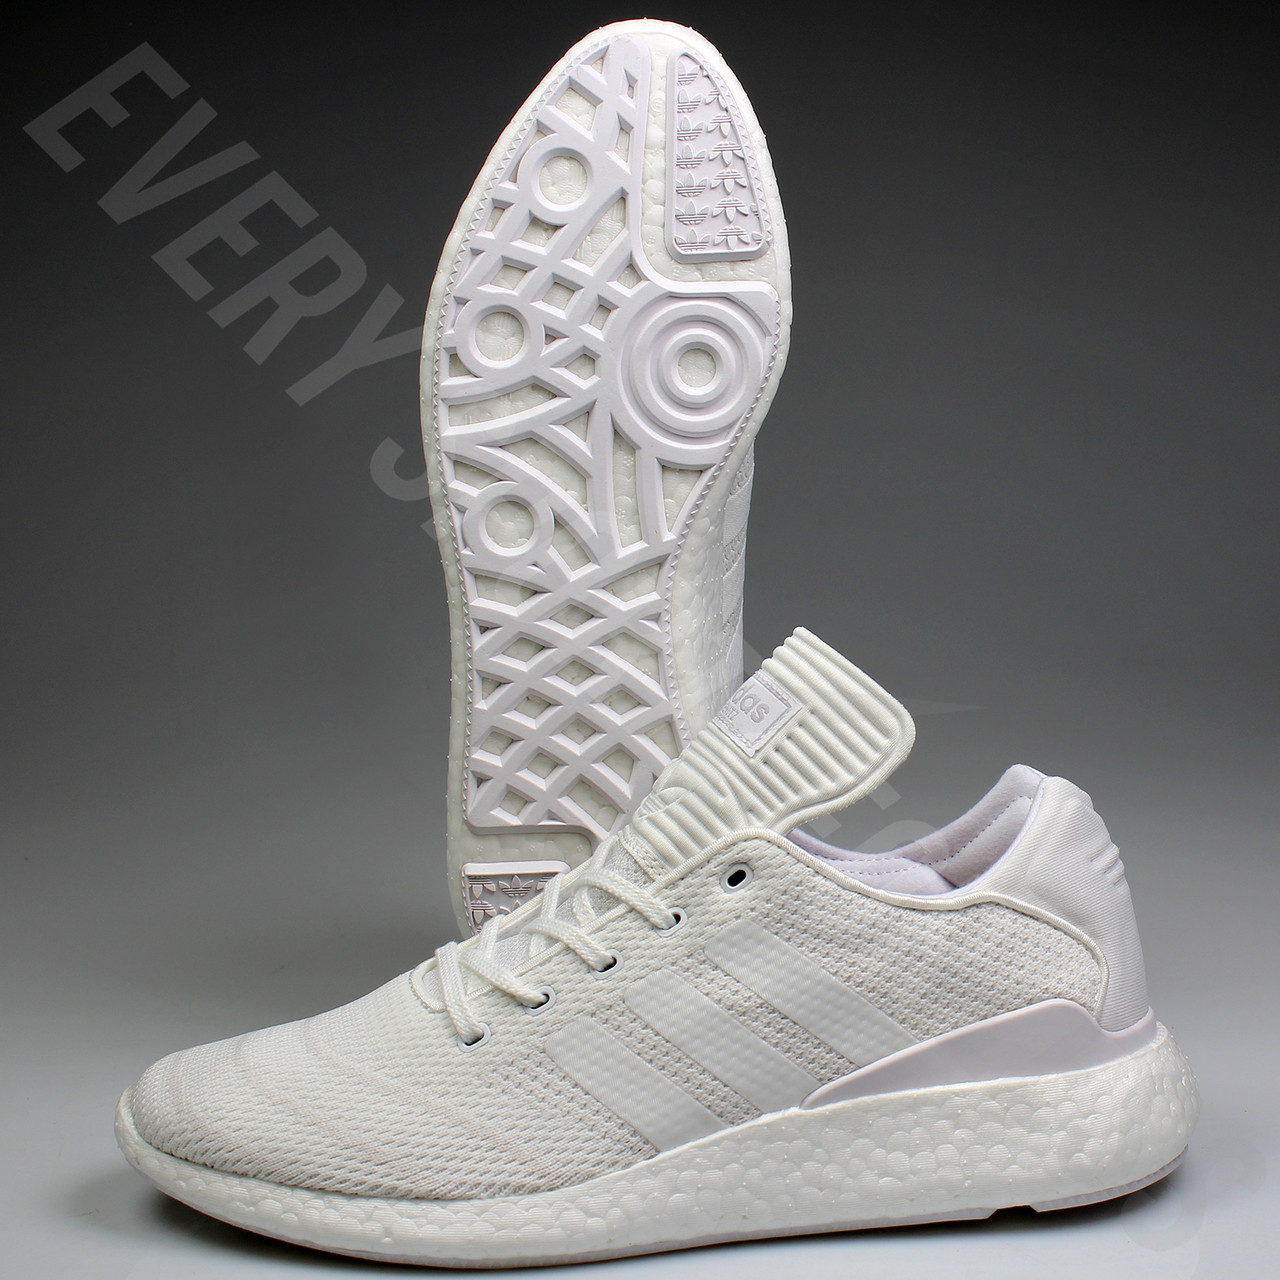 new styles 9950b 48103 ... Adidas Busenitz Pure Boost PK Men s Skateboard Shoes BB8376 - ...